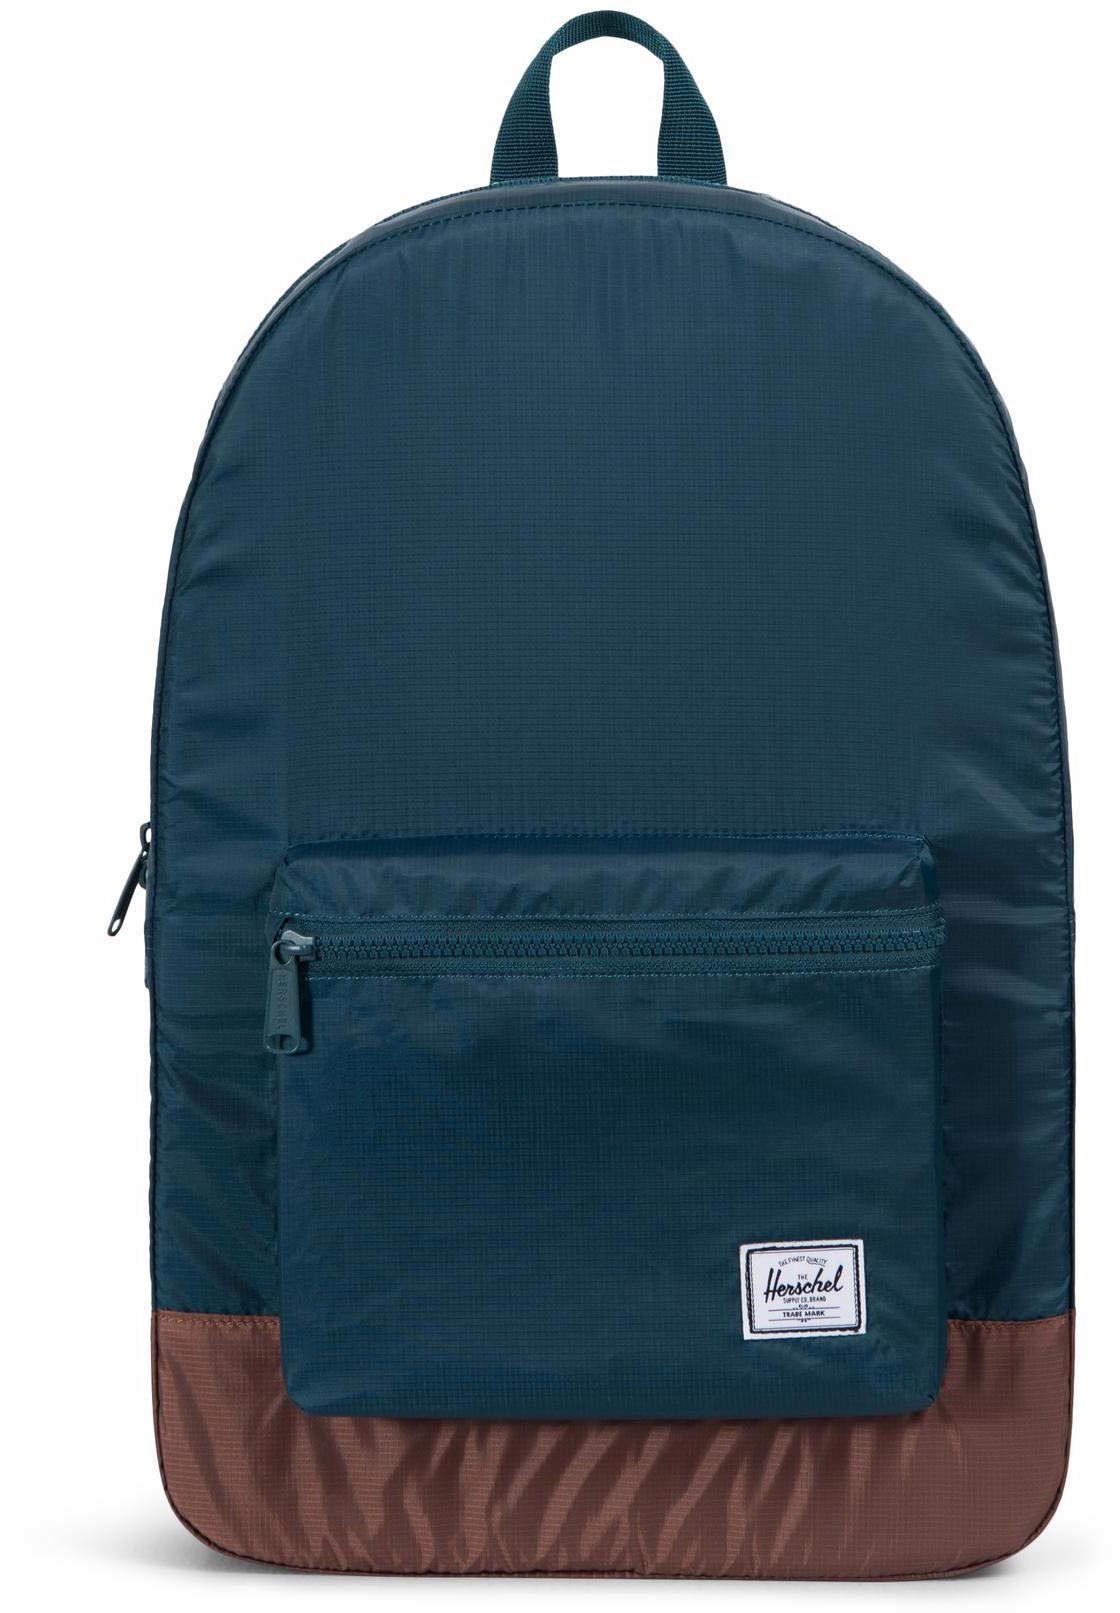 Herschel Rucksack, »Daypack Packable, Deep Teal/Tan Synthetic Leather«